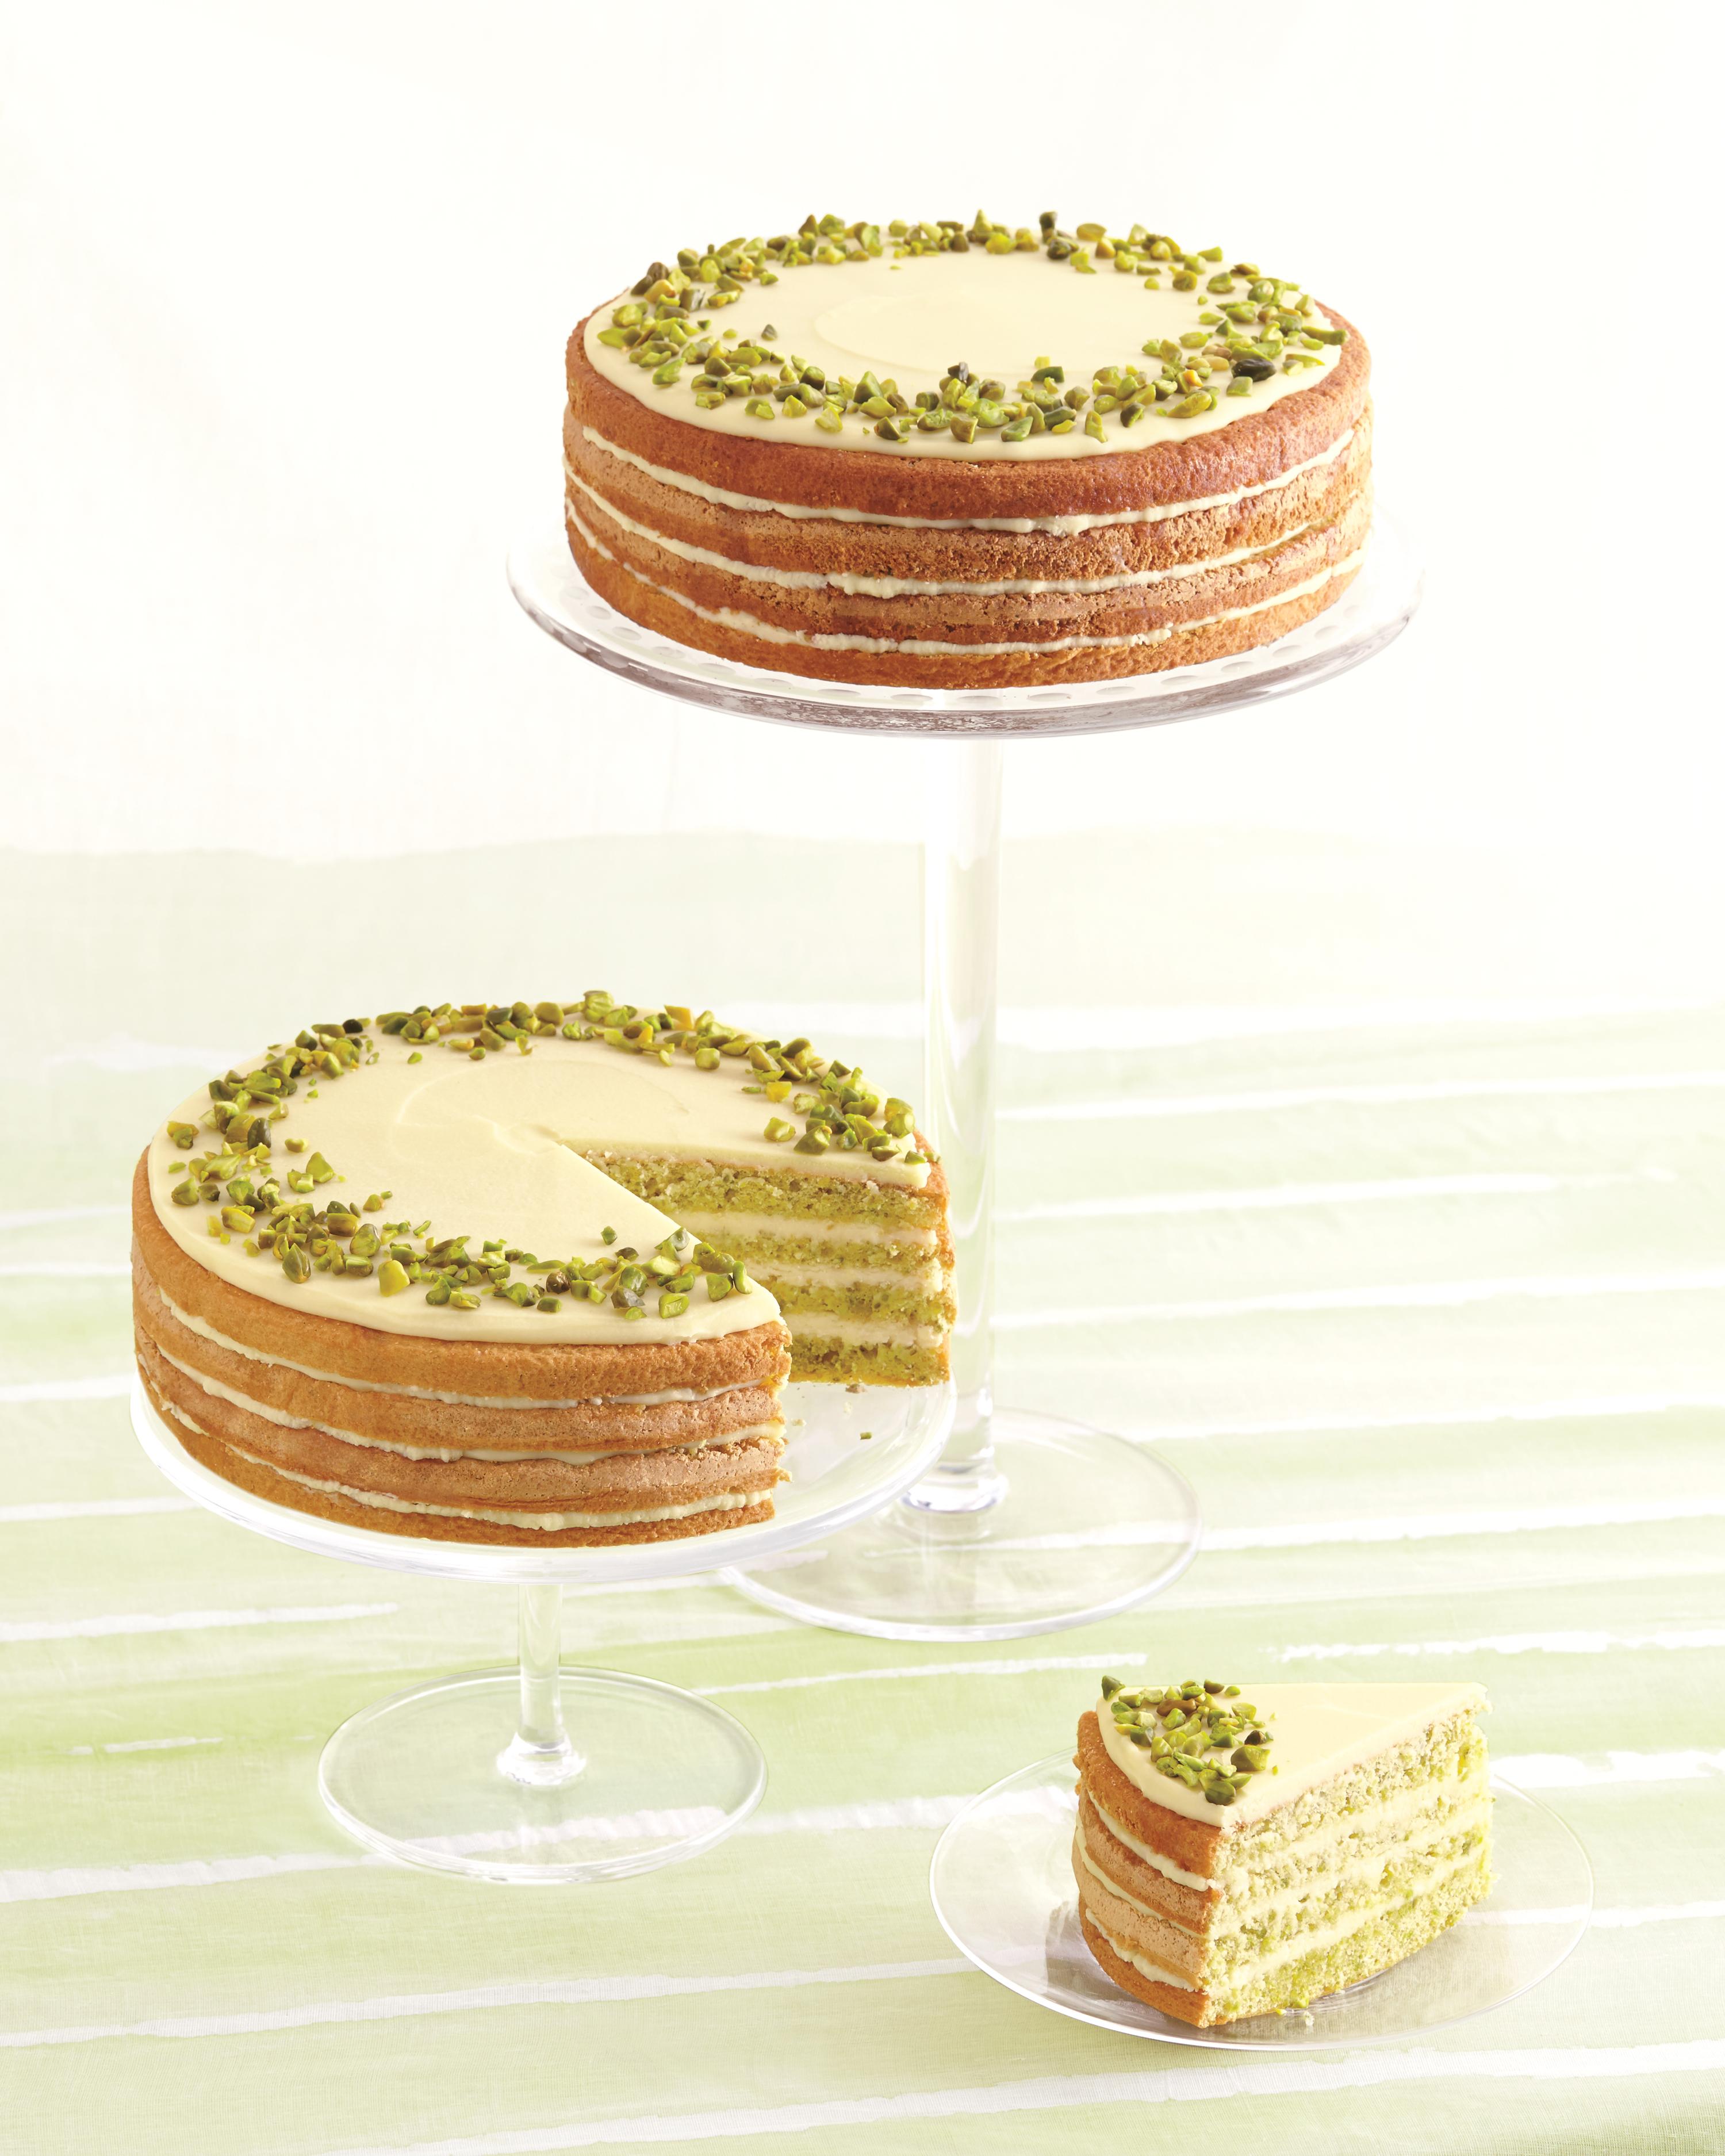 wedding-cake-pistachio-295-d111828-comp.jpg